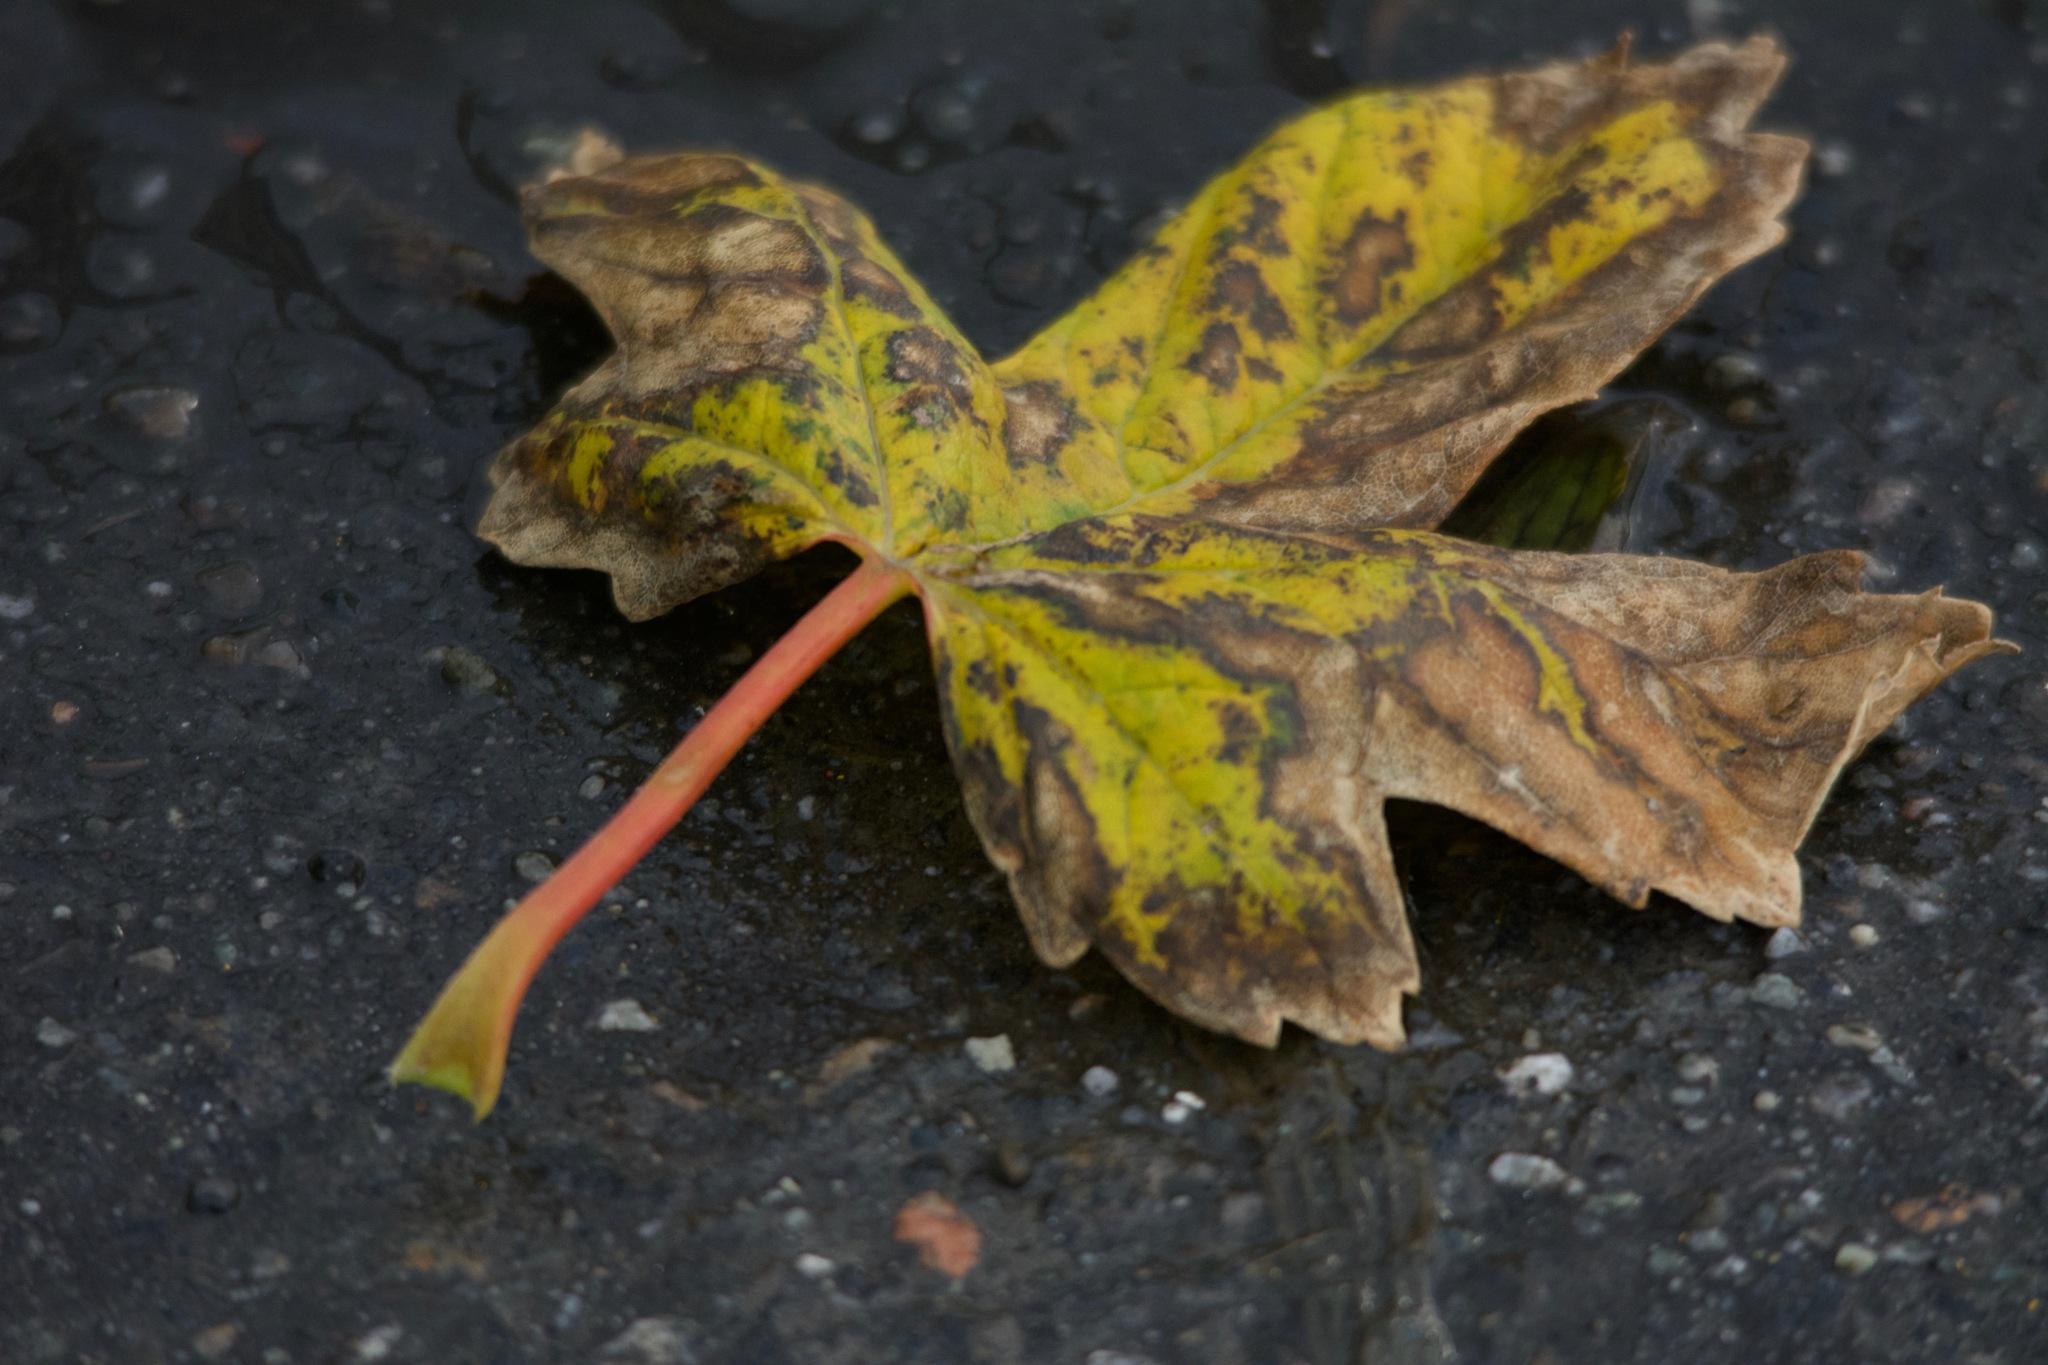 Autumnal 1.028 by Lars-Toralf Utnes Storstrand